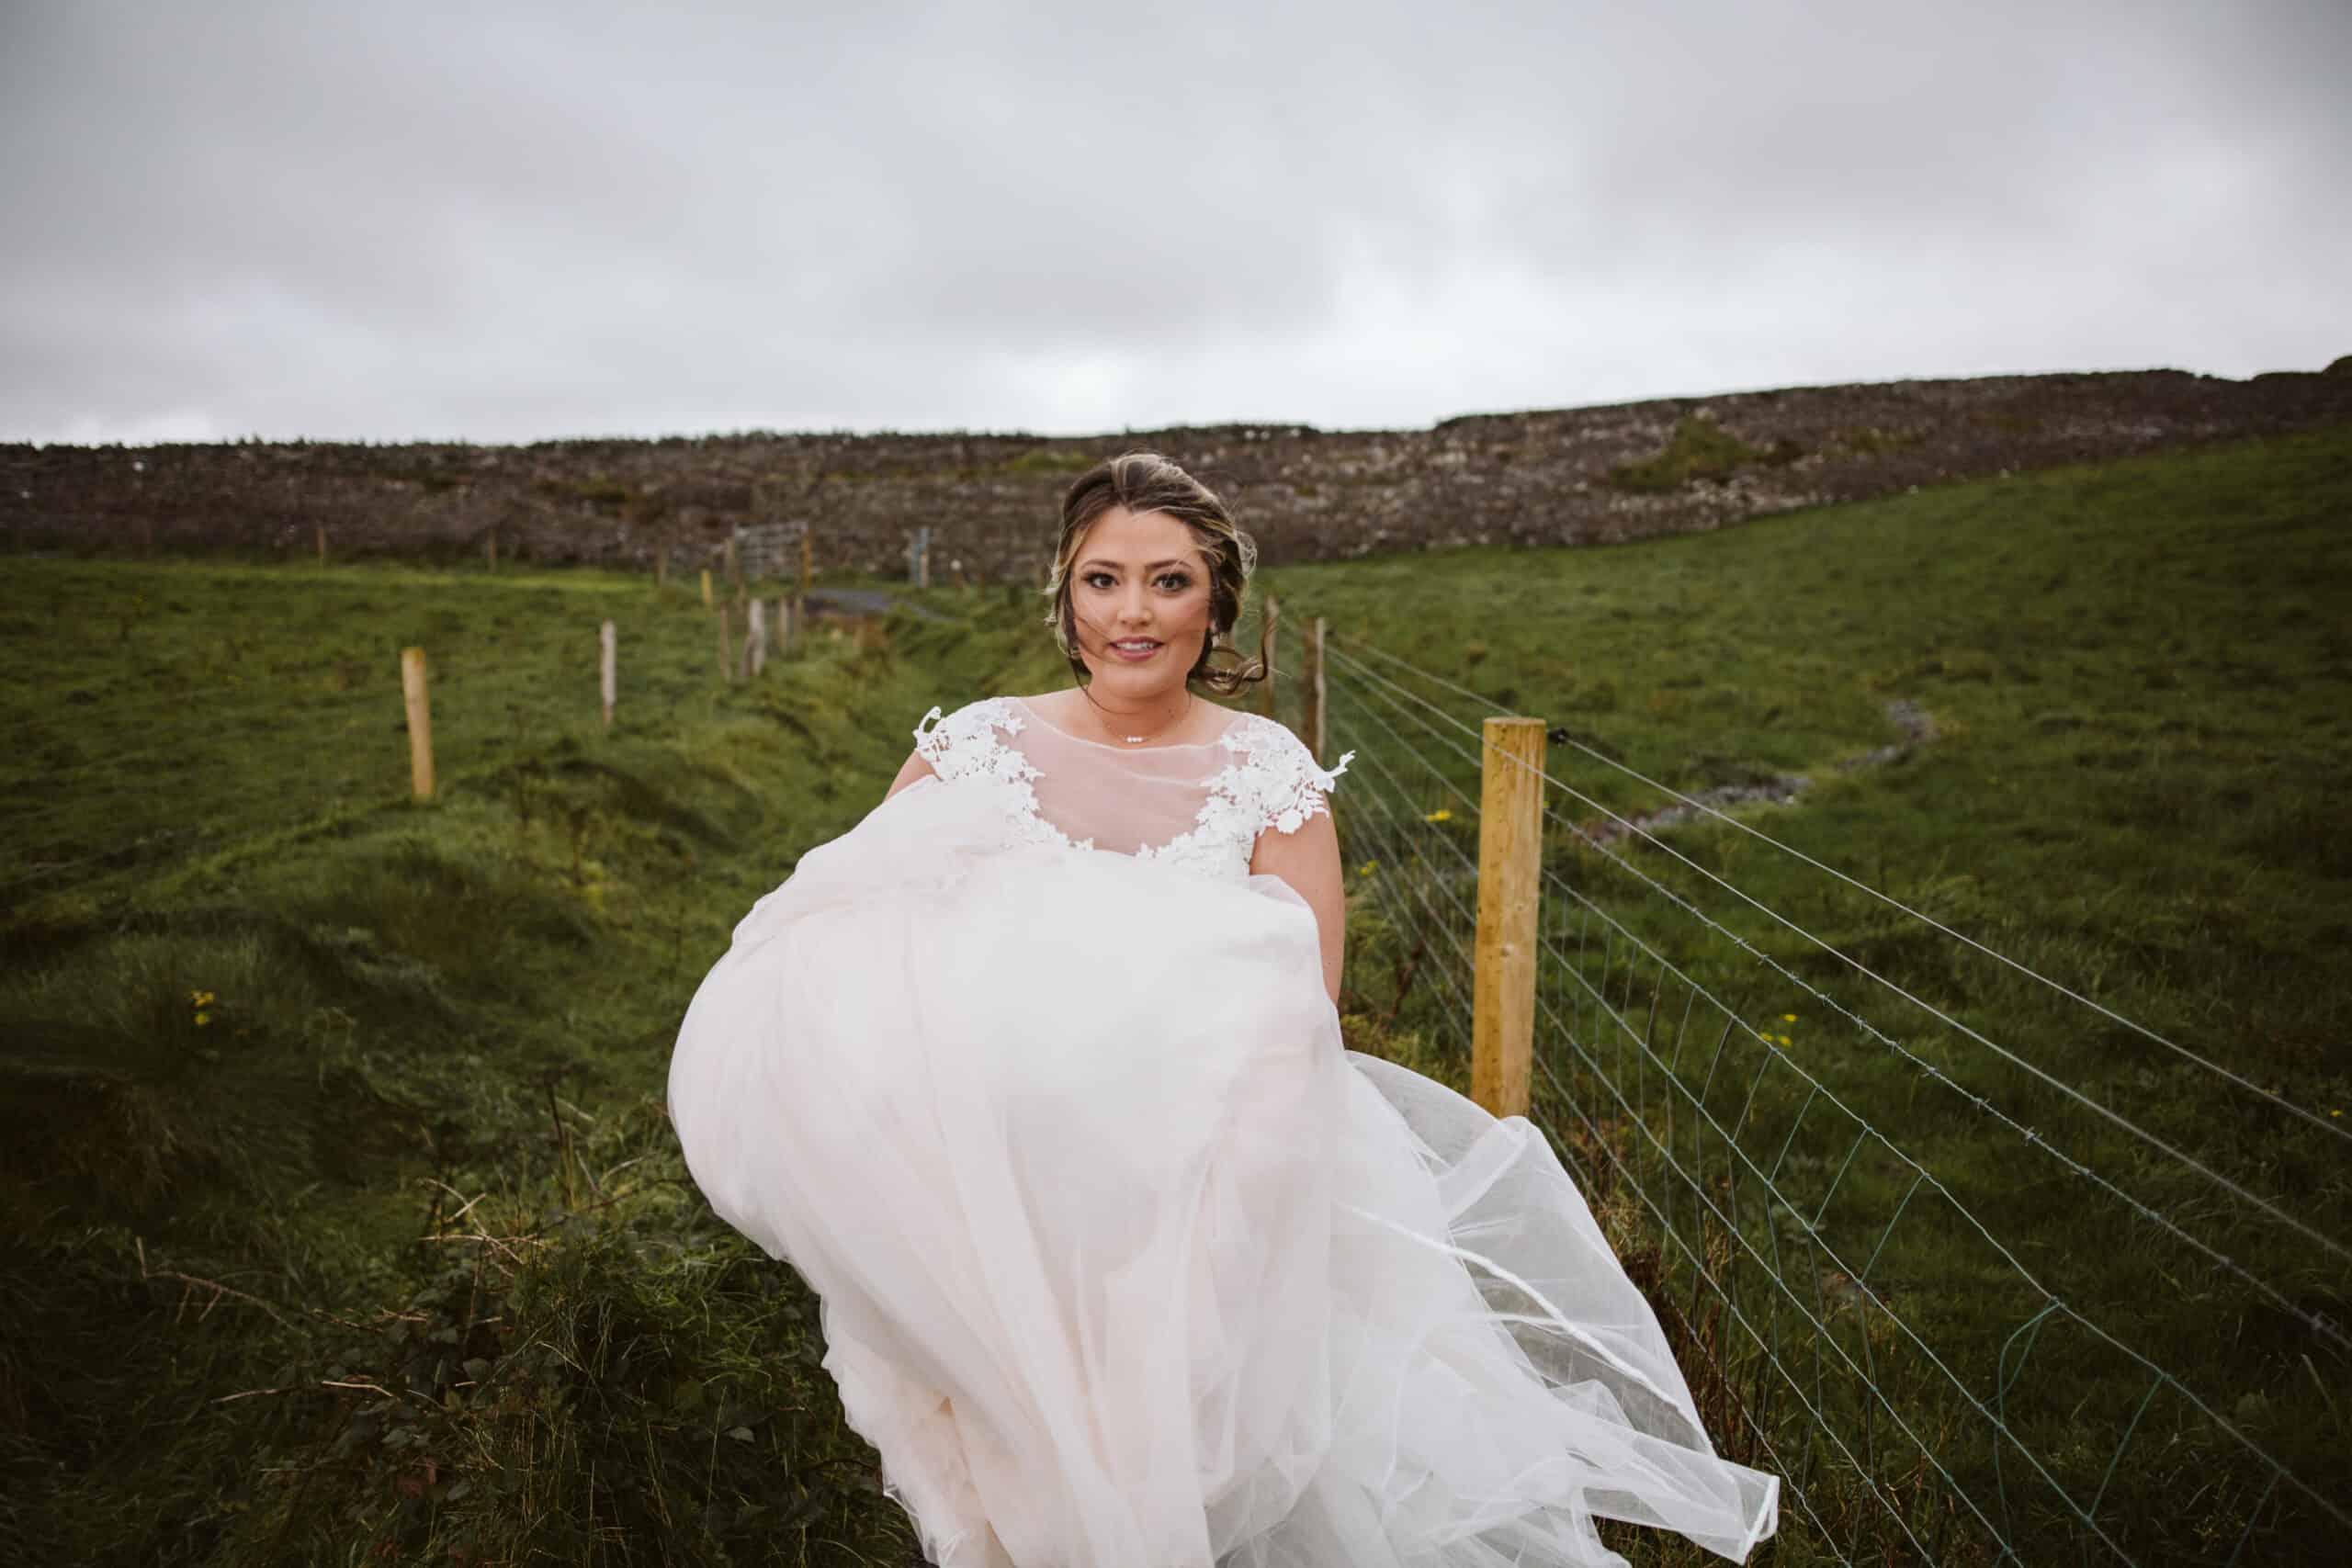 Cliffs of Moher Wedding Hags head, bride walking towards the cliffs